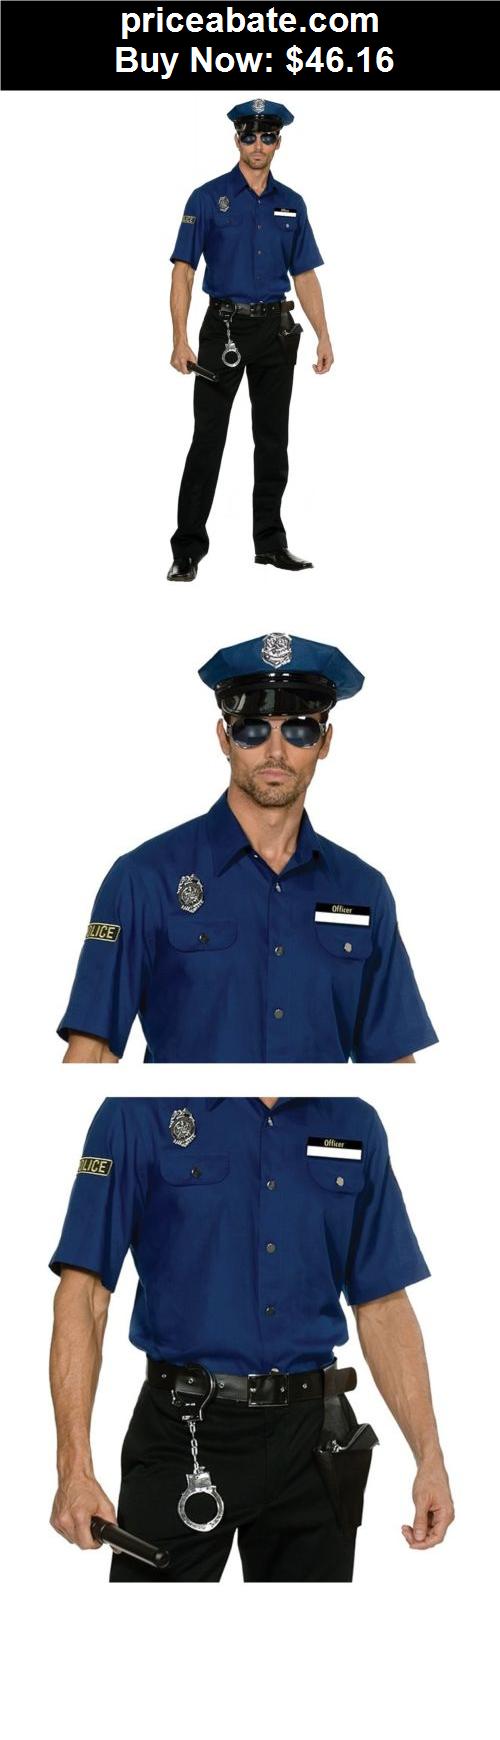 Men-Costumes Police Costume for Men Adult Cop Halloween Fancy Dress - BUY IT  sc 1 st  Pinterest & Men-Costumes: Police Costume for Men Adult Cop Halloween Fancy Dress ...